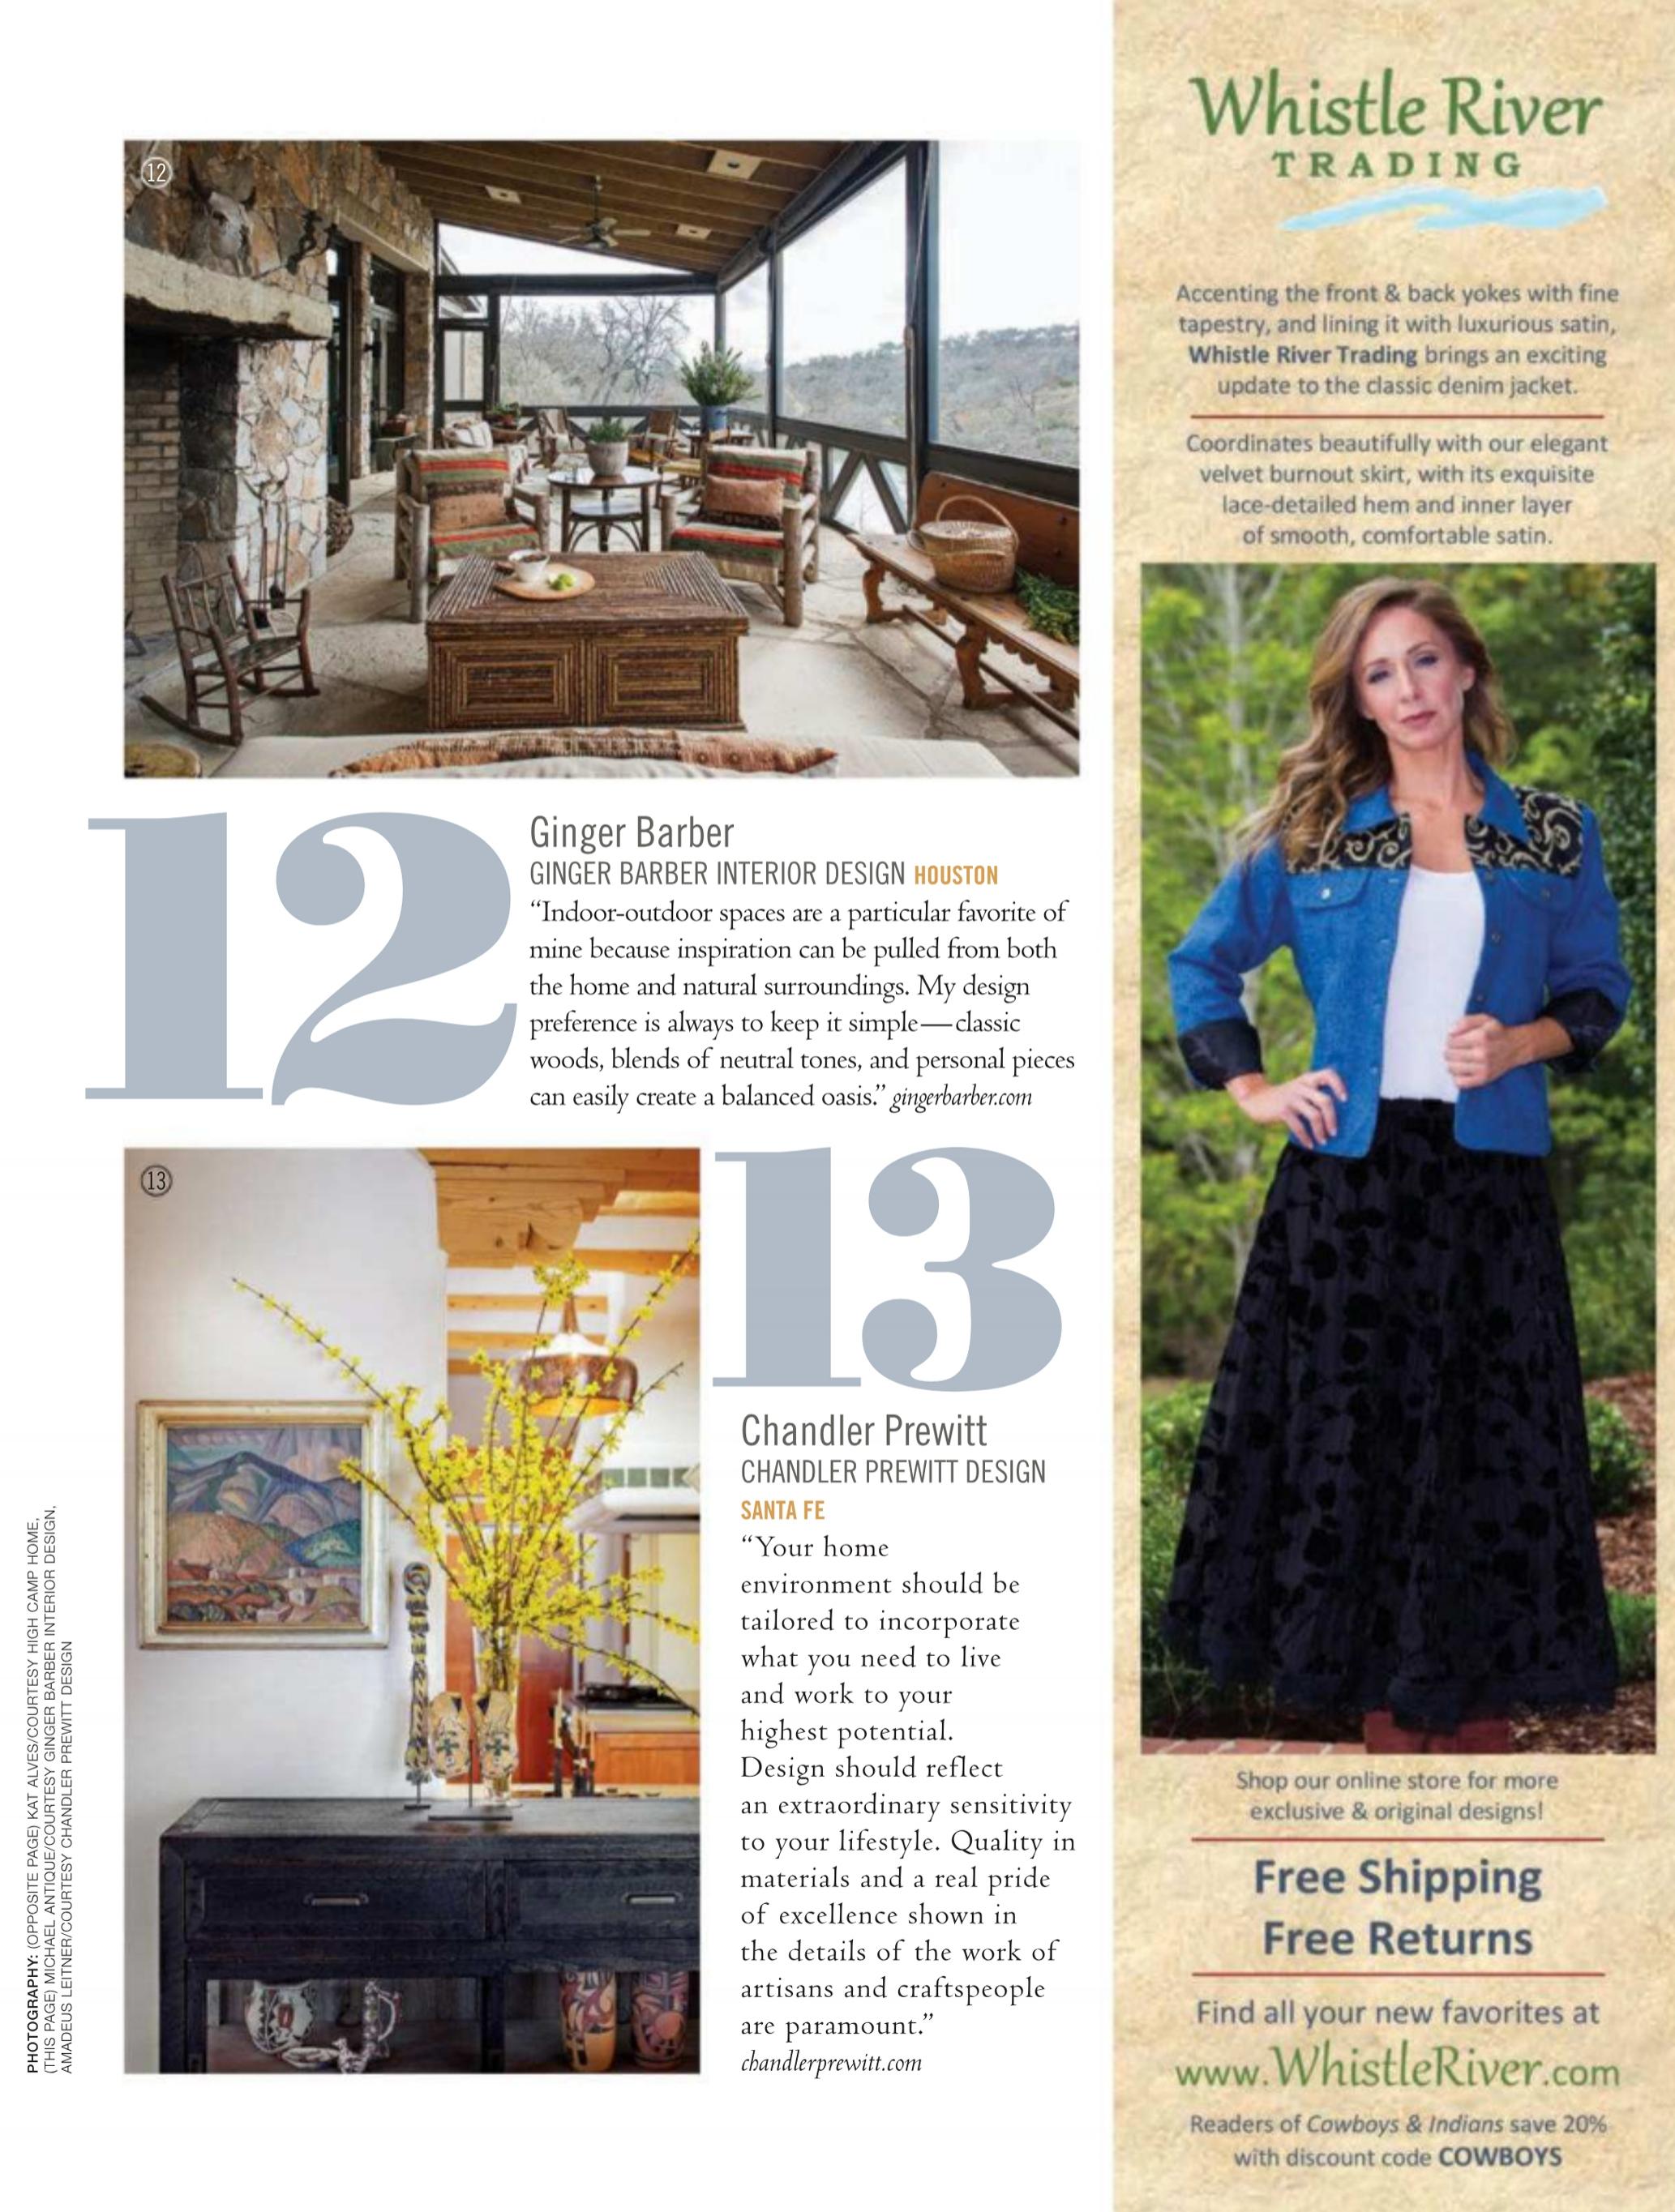 Chandler-Prewitt-Interiors-Cowboys-Indians-Magazine-2018_article_sm.jpg